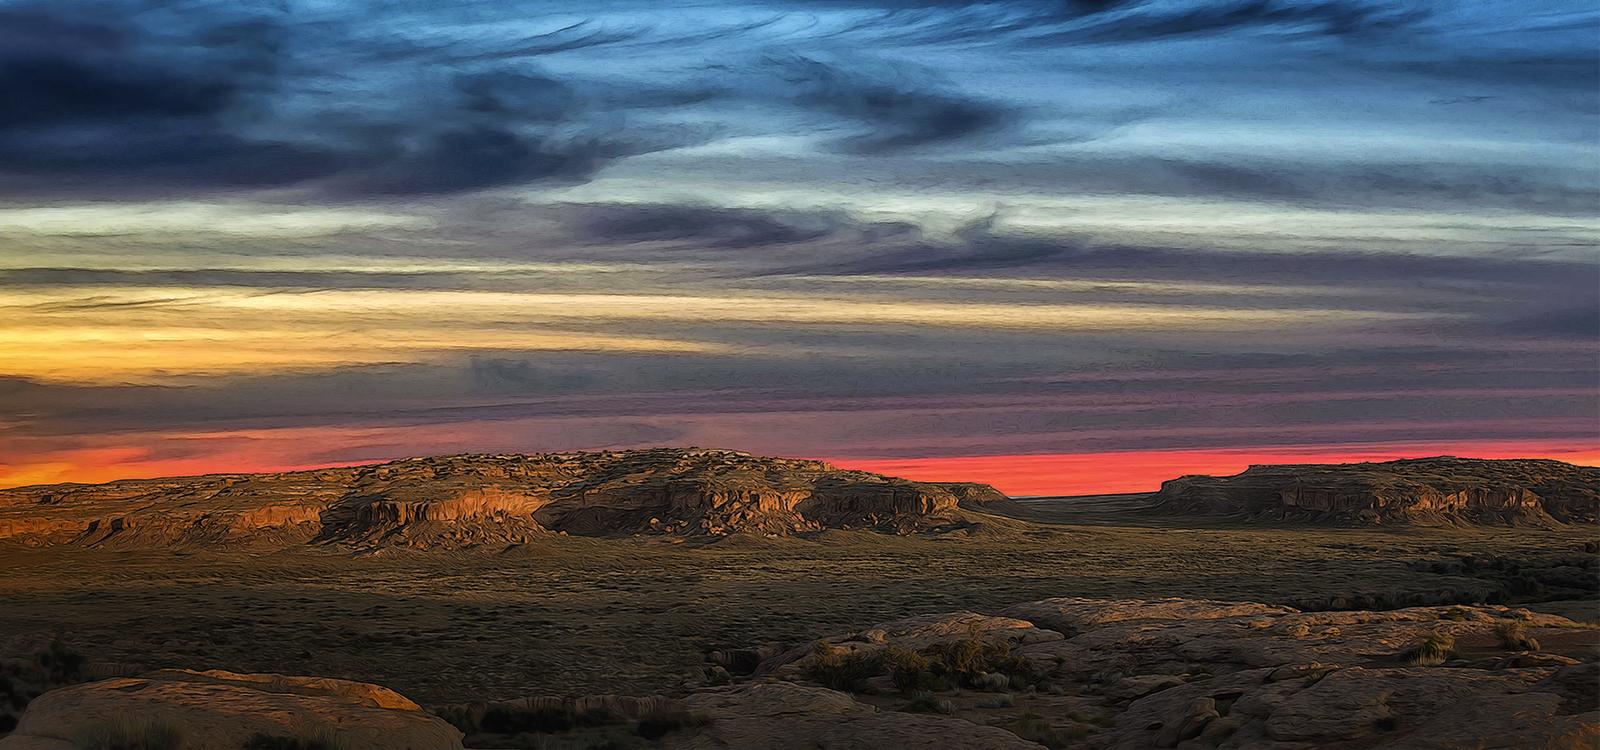 Image hotlink - 'http://skystudios.net/wp-content/uploads/2015/11/Chaco_Canyon__Twilight.jpg'